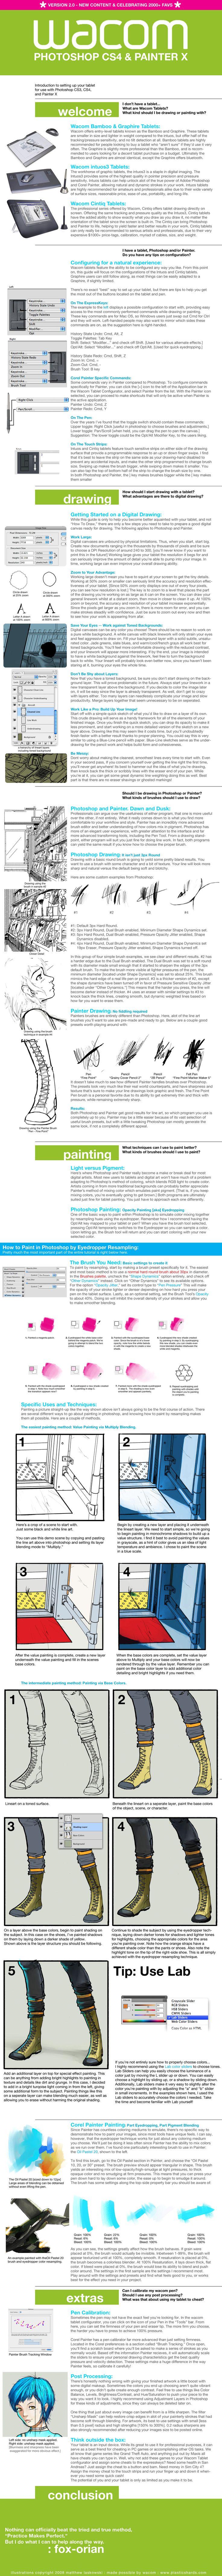 http://fc06.deviantart.net/fs40/f/2009/055/5/4/Wacom_Photoshop_Painter___v2_0_by_fox_orian.jpg